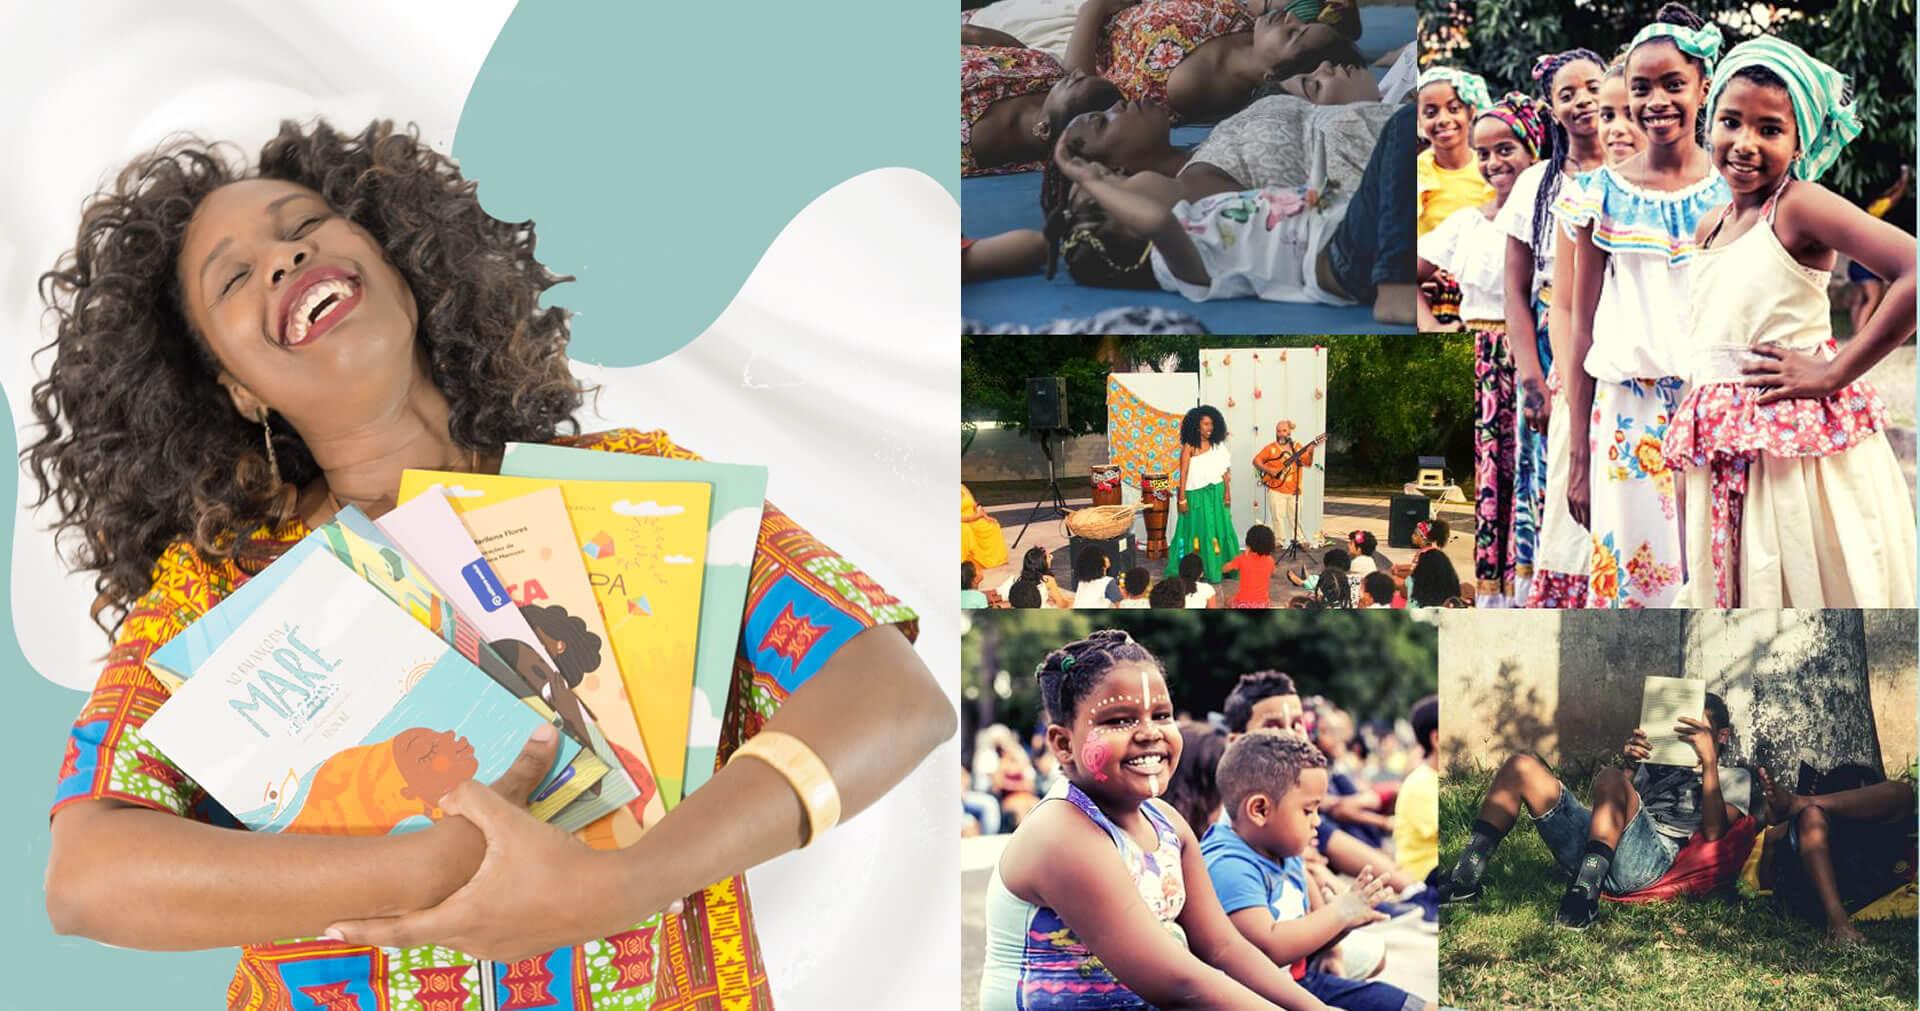 Clipping | Campanha junta recursos para realizar evento gratuito que exalta a diversidade na infância